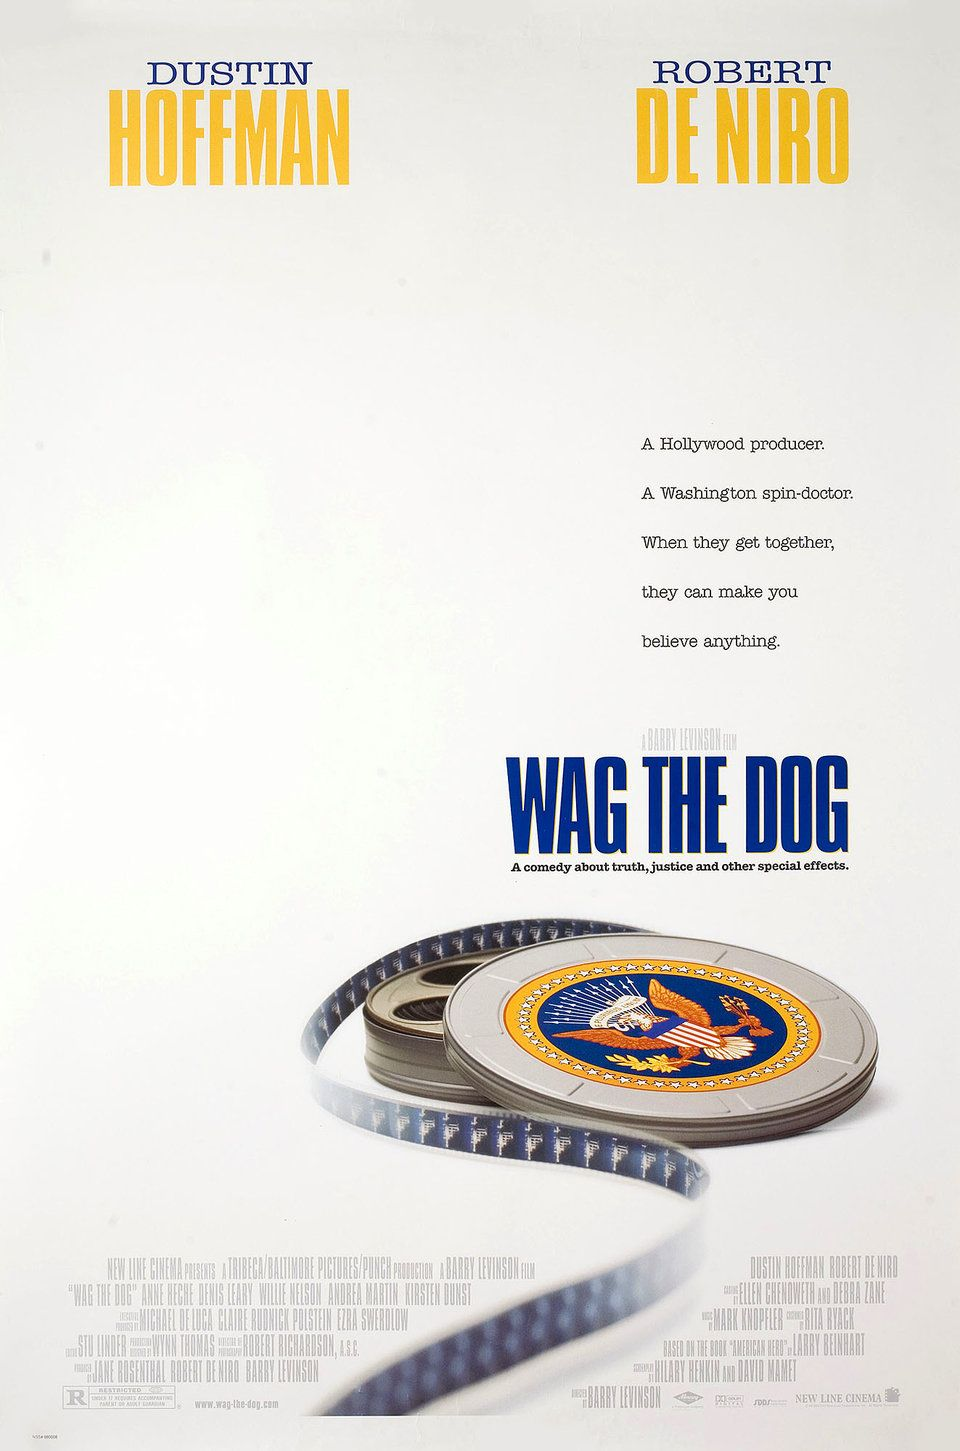 Wag the Dog 1997 U.S. One Sheet Poster Posteritati Movie